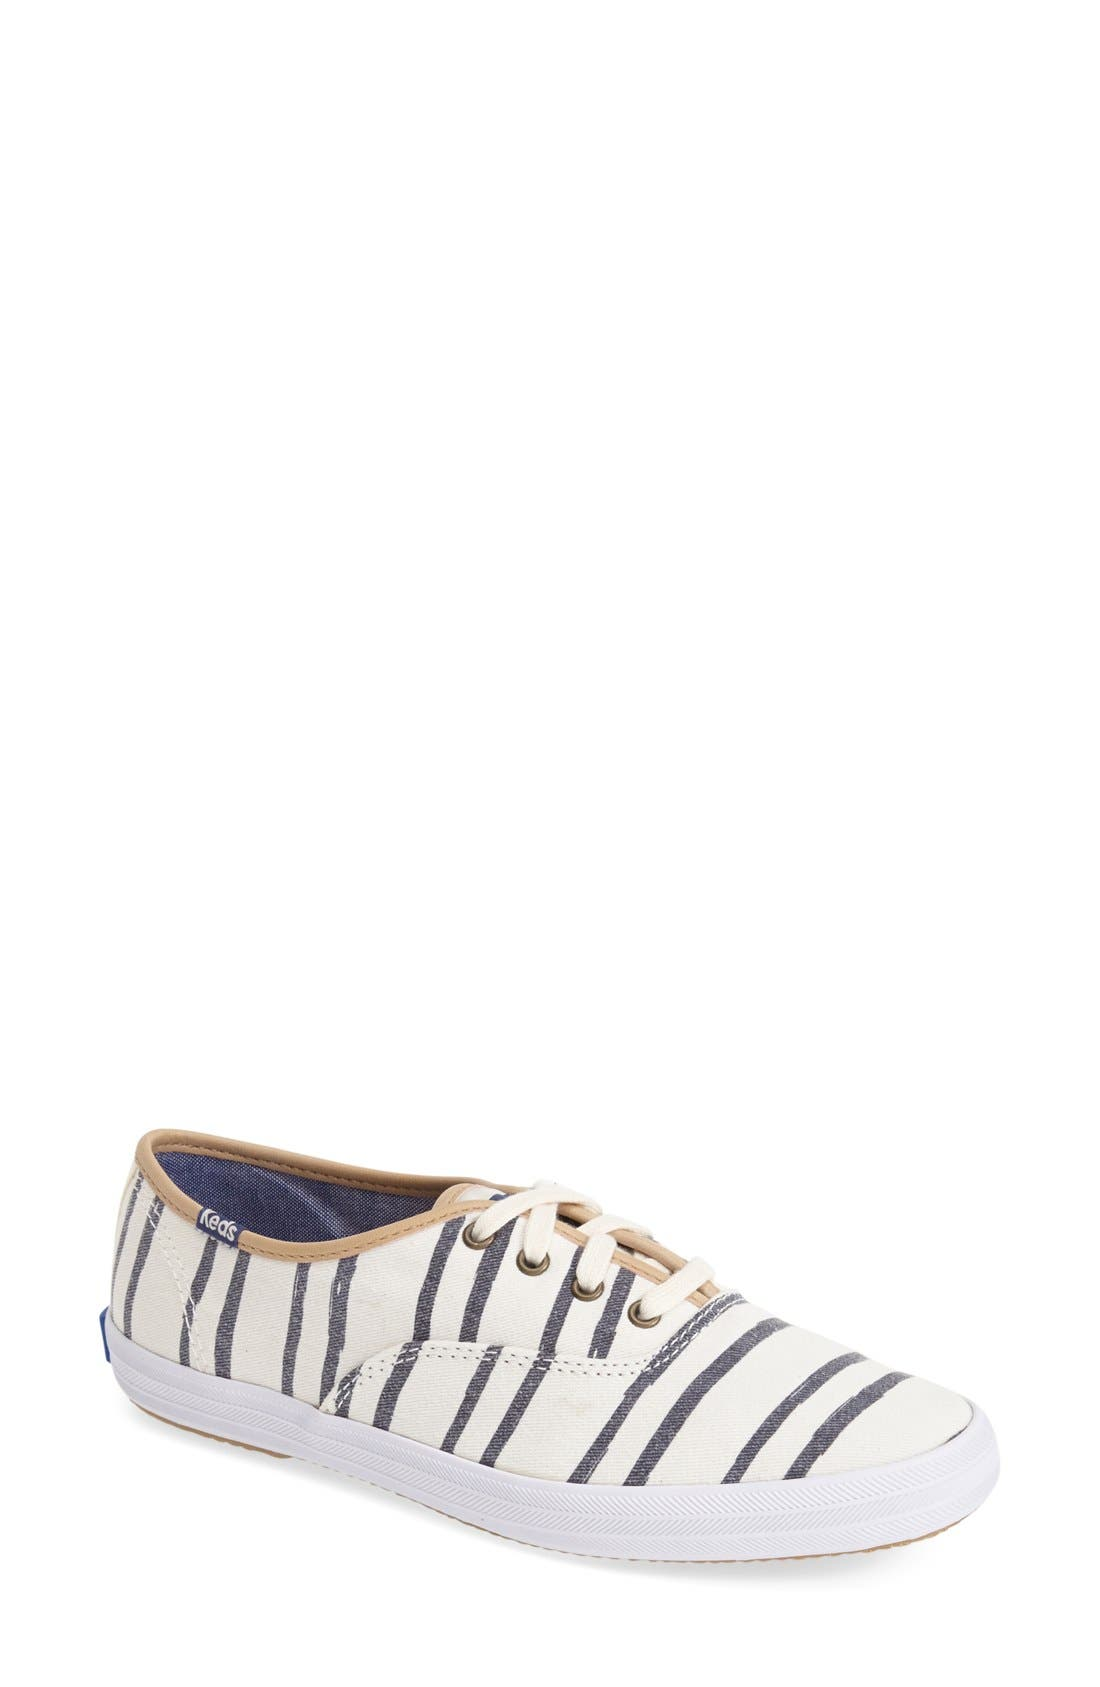 Main Image - Keds® 'Champion - Washed Beach Stripe' Sneaker (Women)